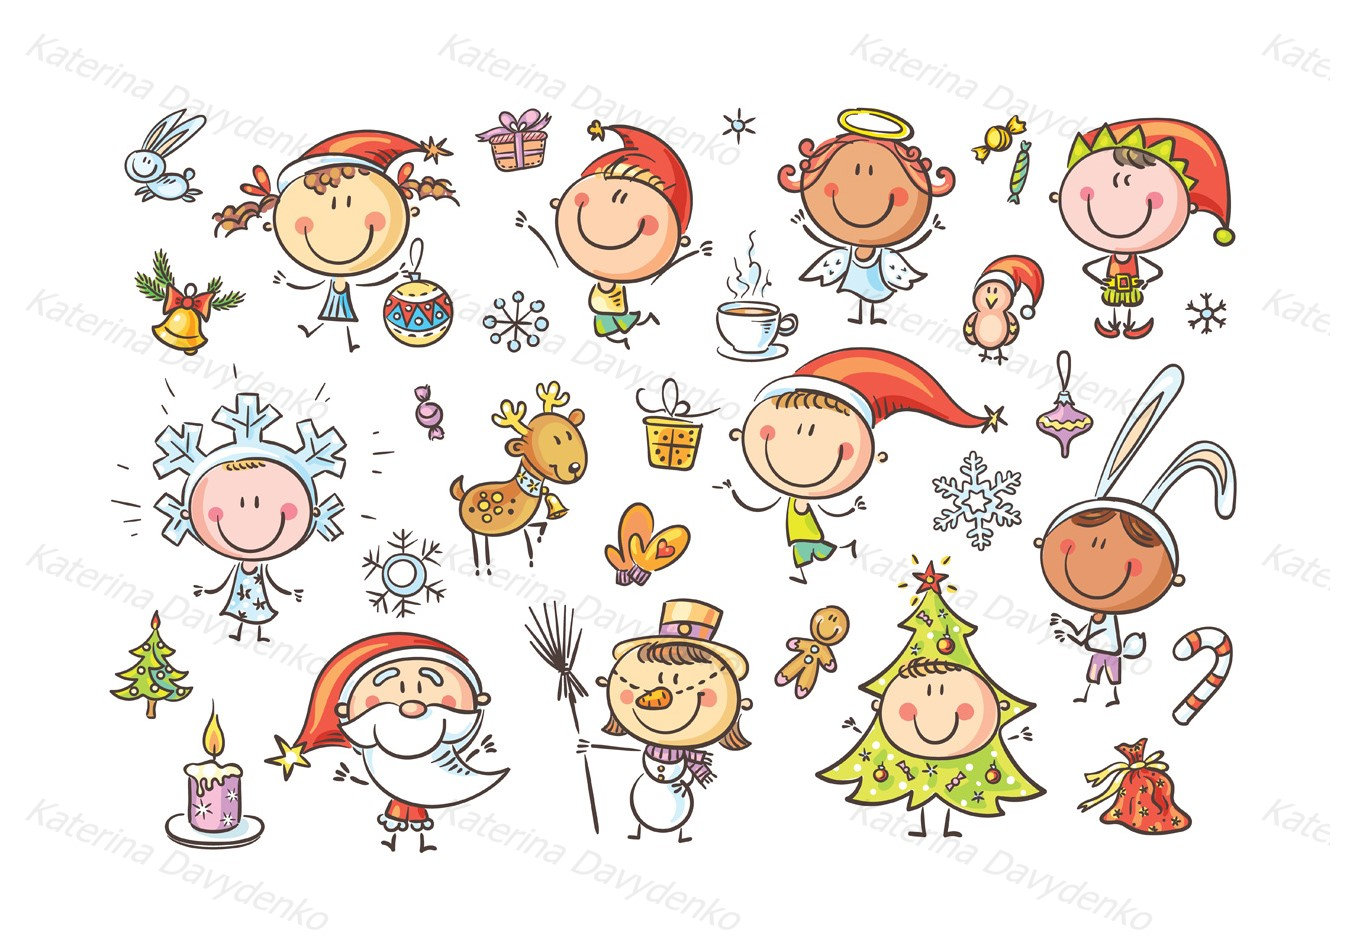 Christmas Kids. Christmas clipart clipart children doodle | Etsy